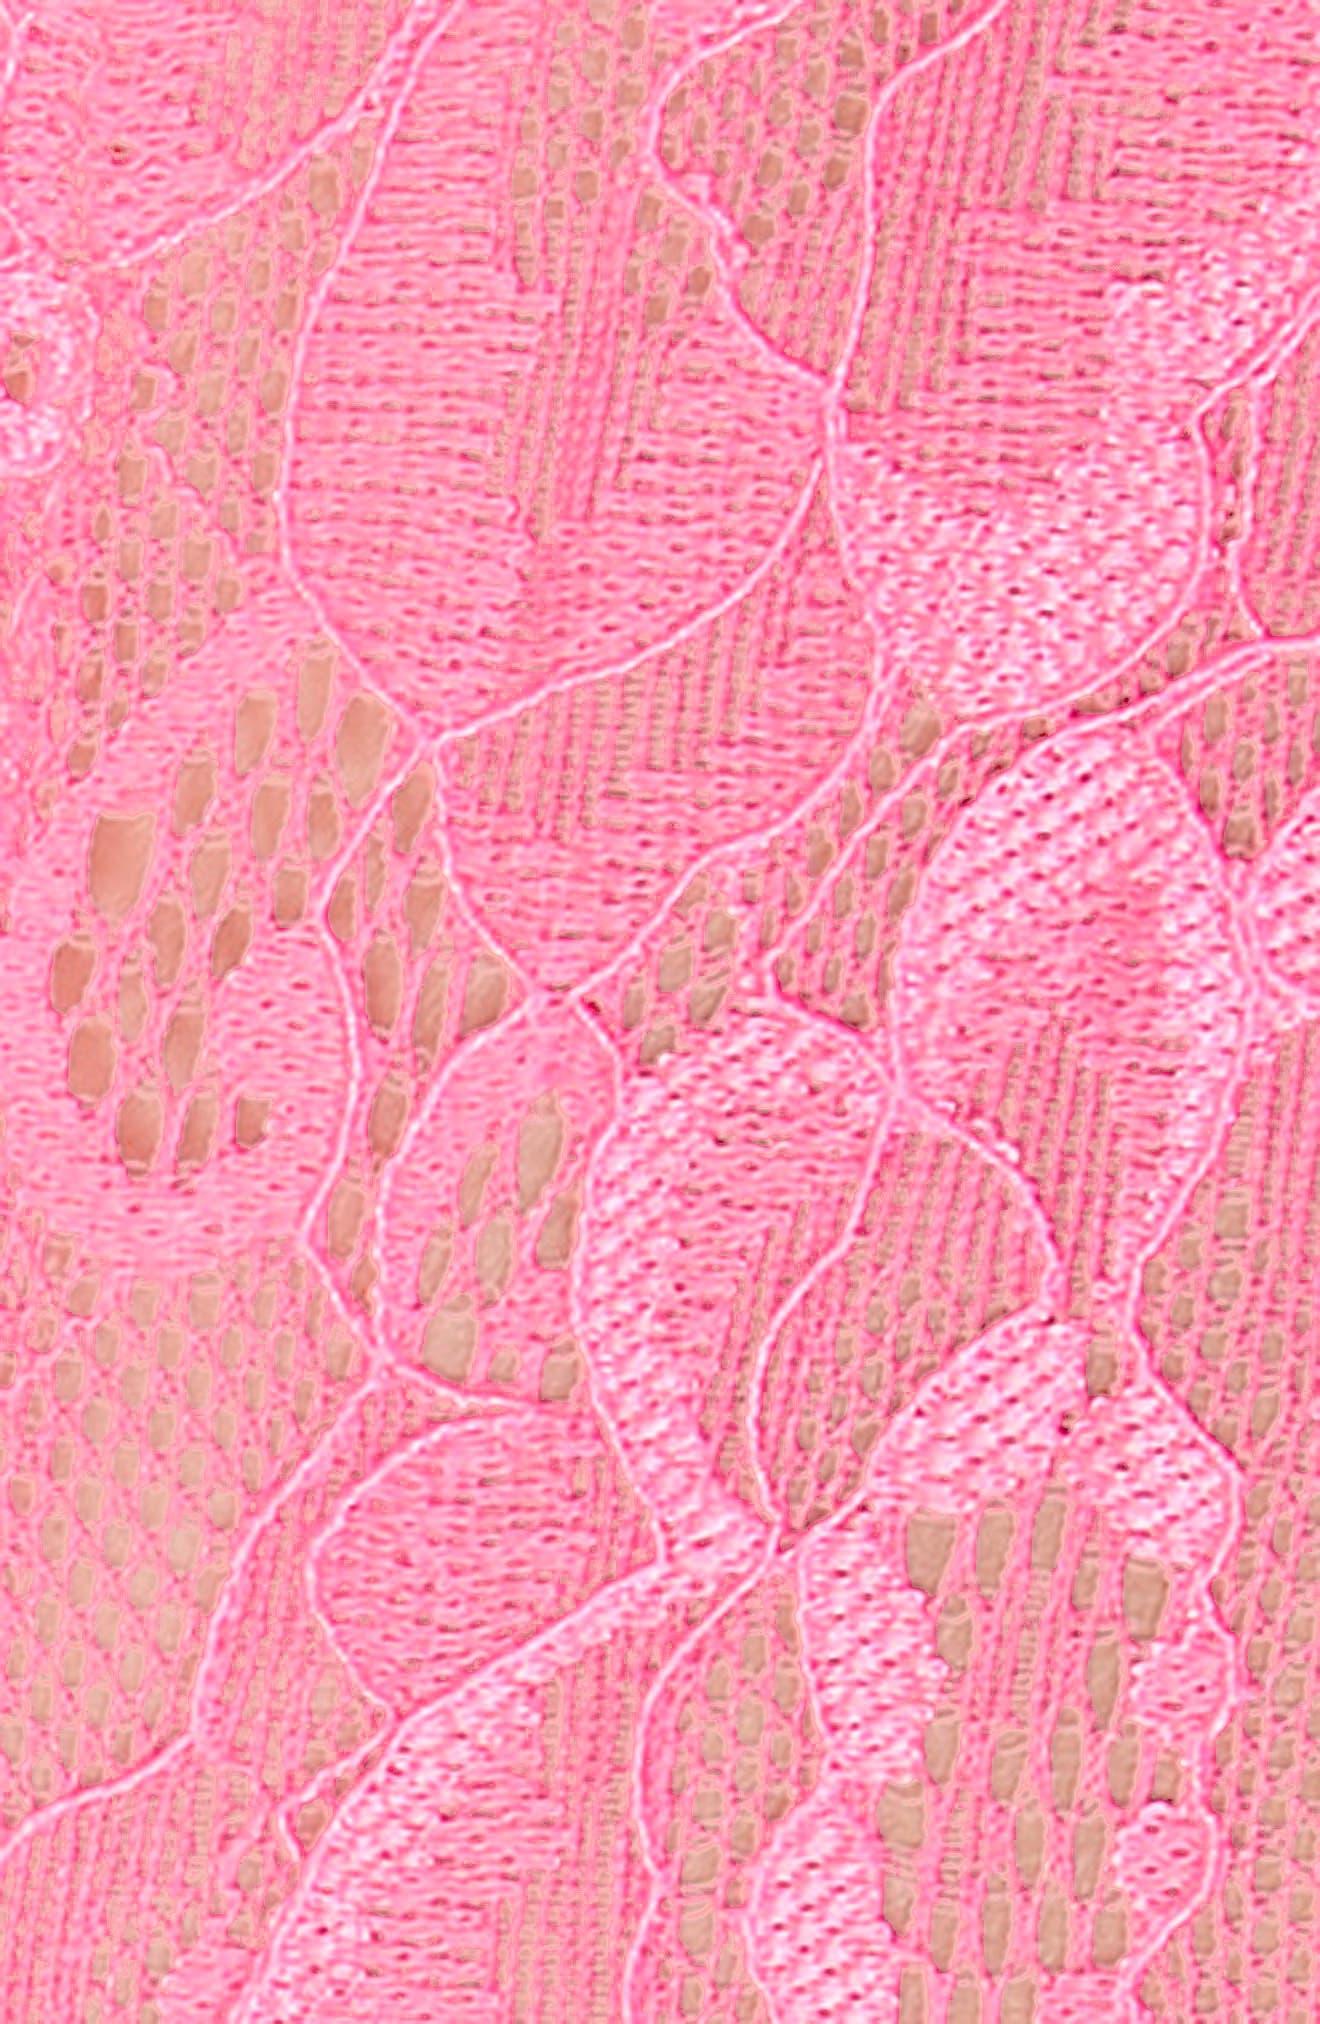 Honeydew Lace Bikini,                             Alternate thumbnail 5, color,                             Bougie